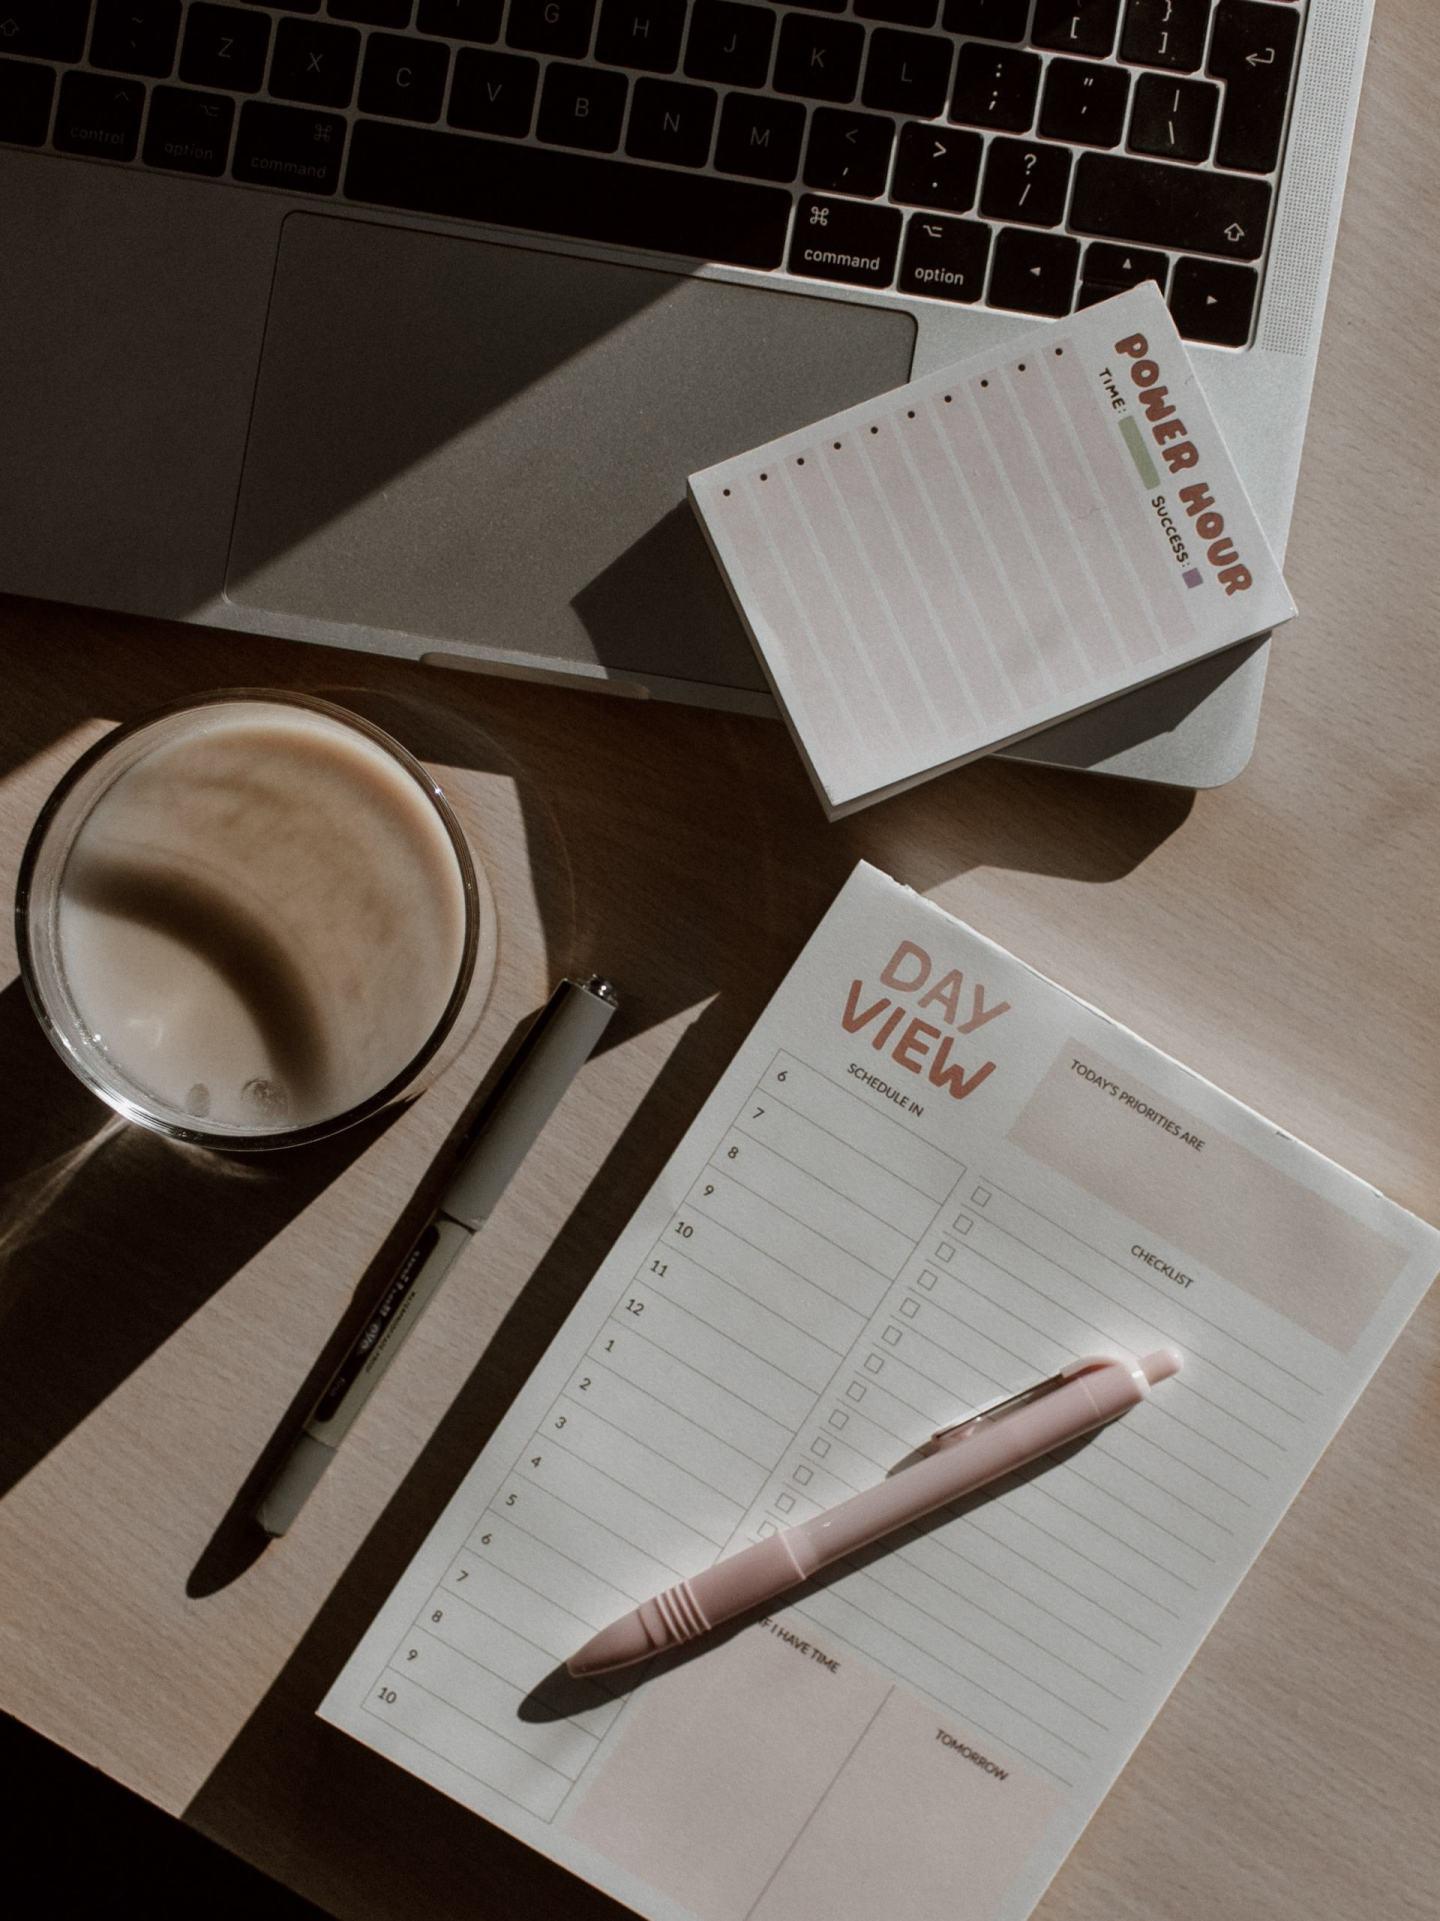 Master's organisation tips for online learning